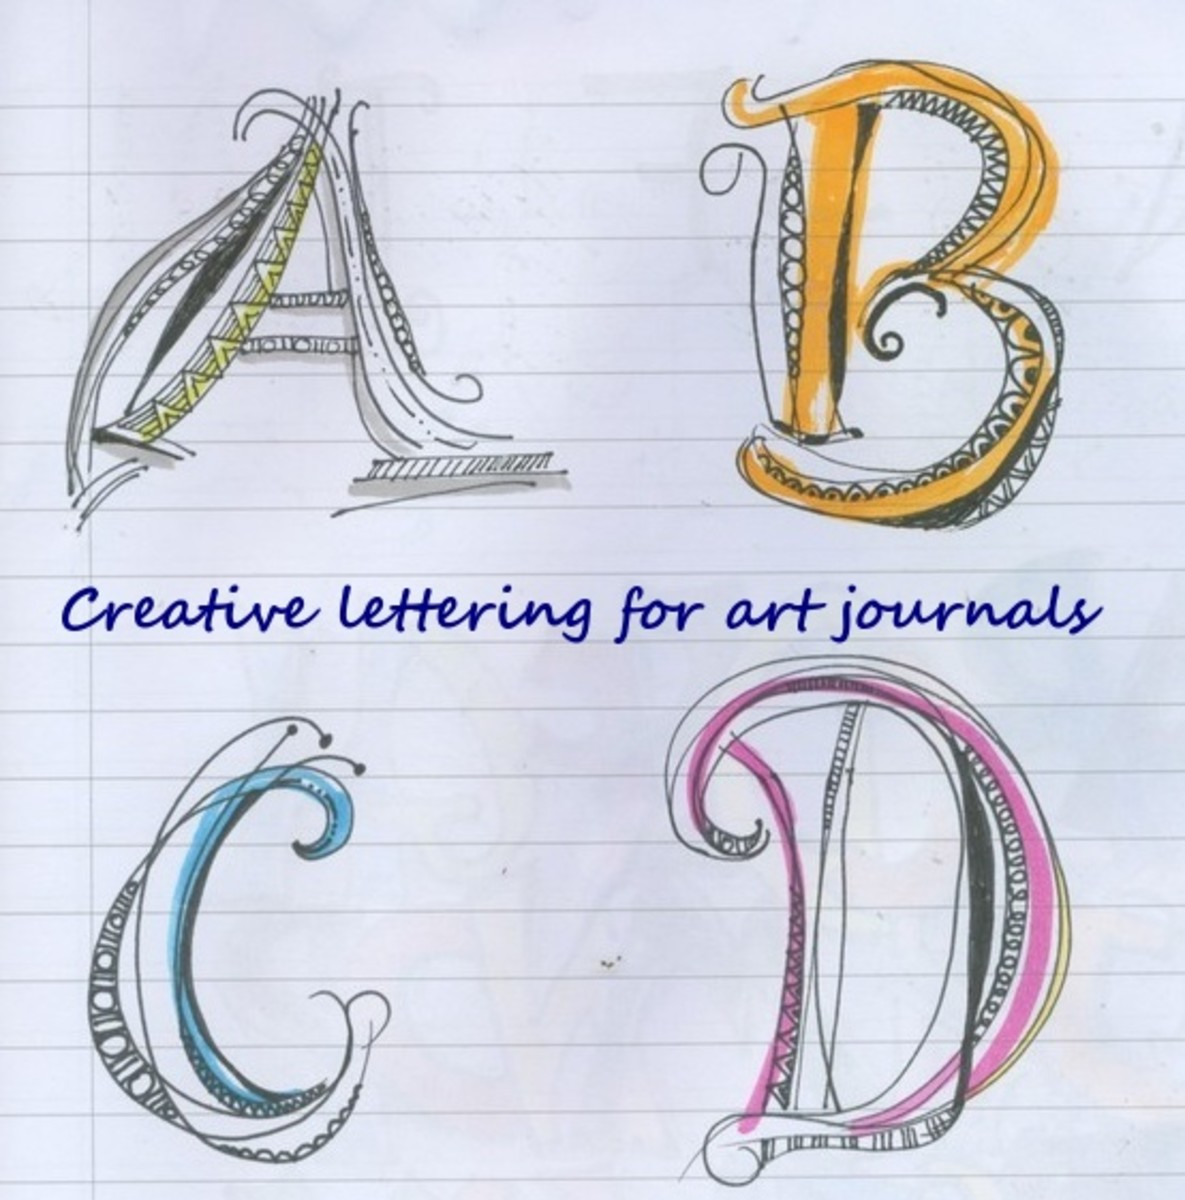 Creative Lettering for Art Journals